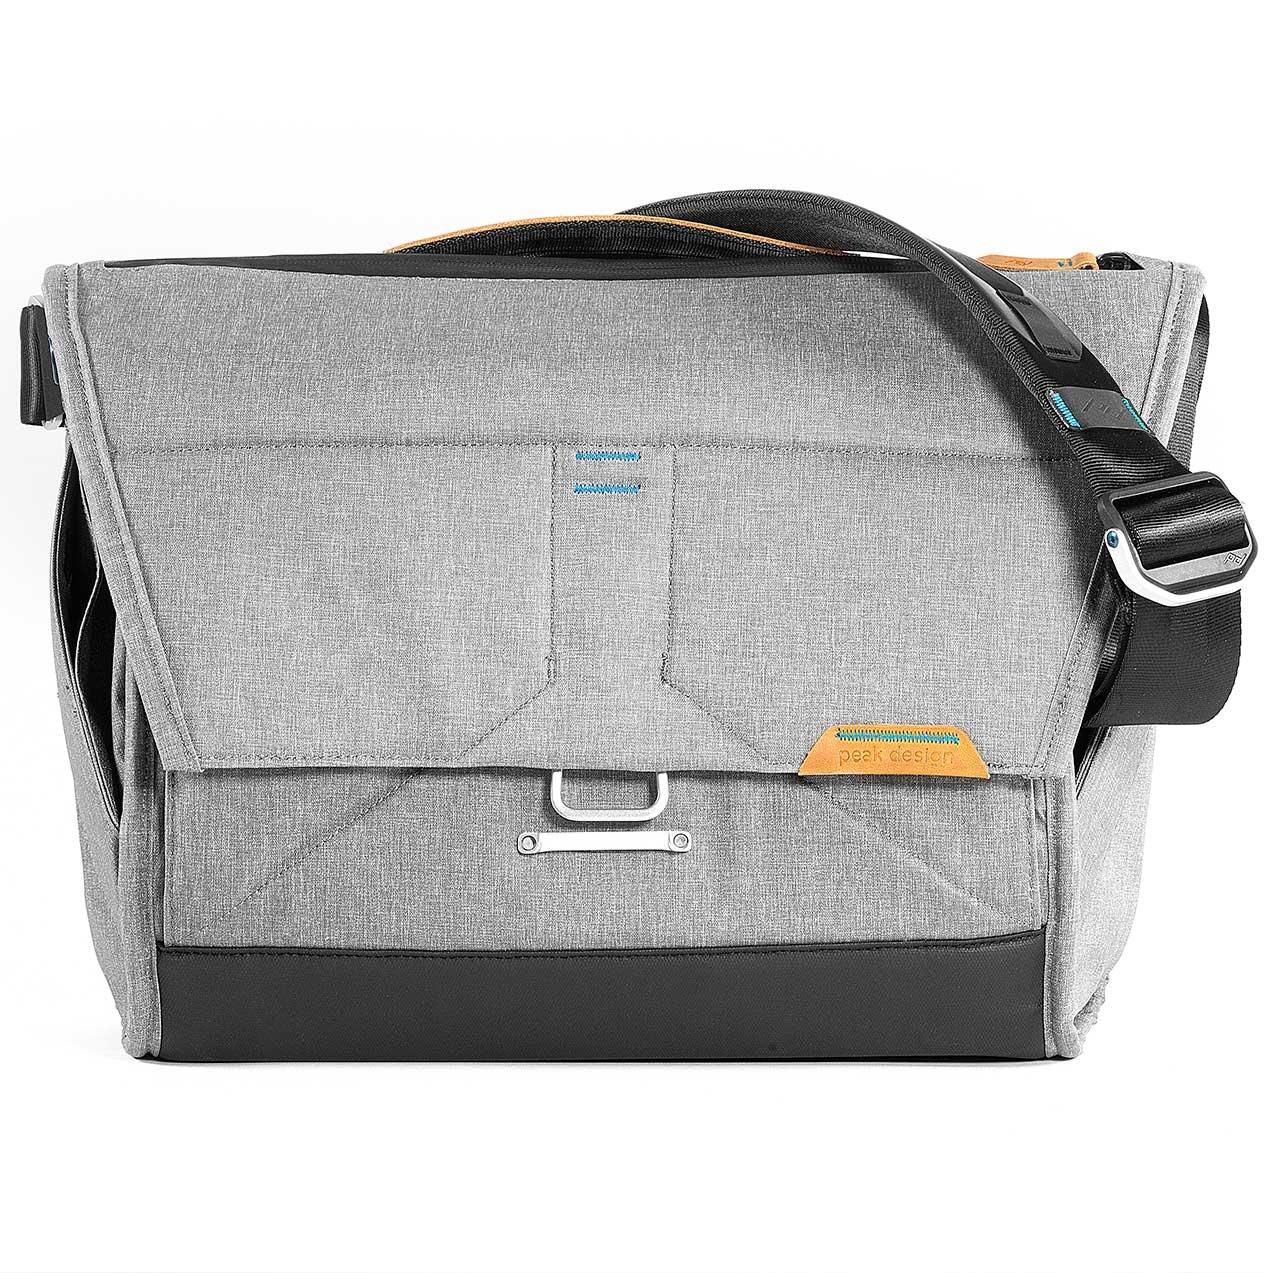 Peak Design Everyday Messenger Bag 15'' (Ash) Version 1